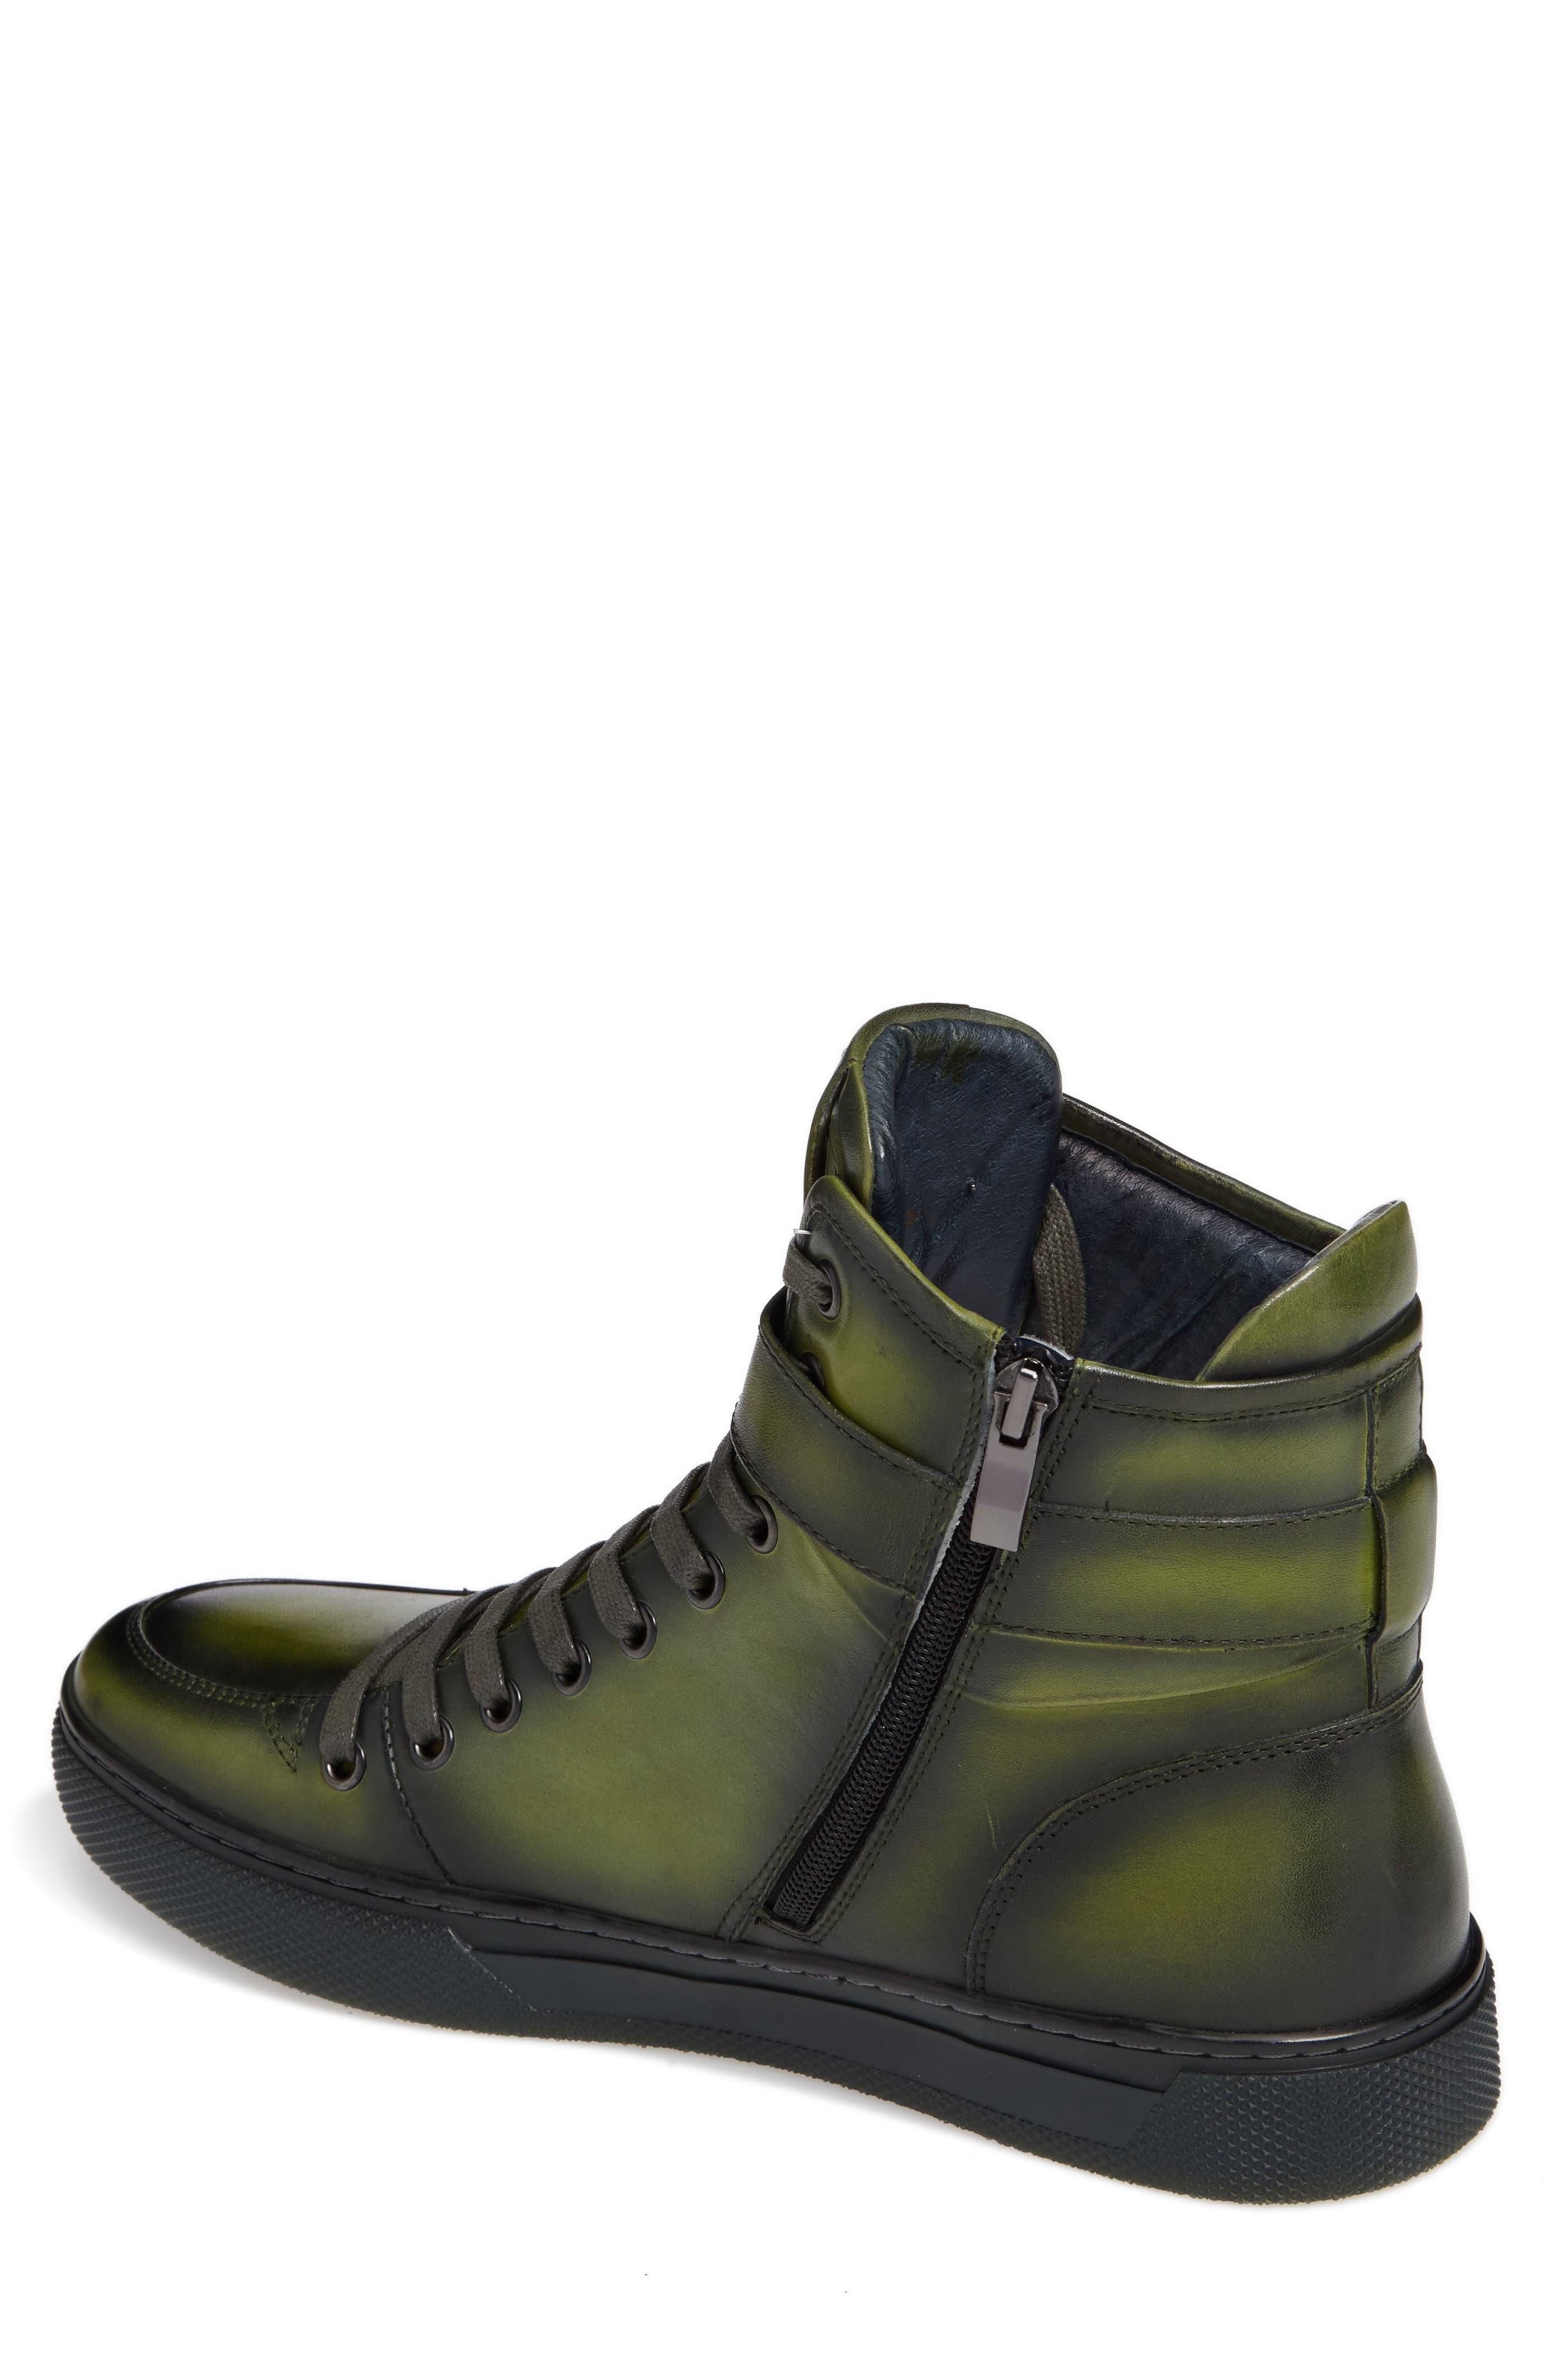 JUMP, Sullivan High Top Sneaker, Alternate thumbnail 2, color, AMAZON GREEN